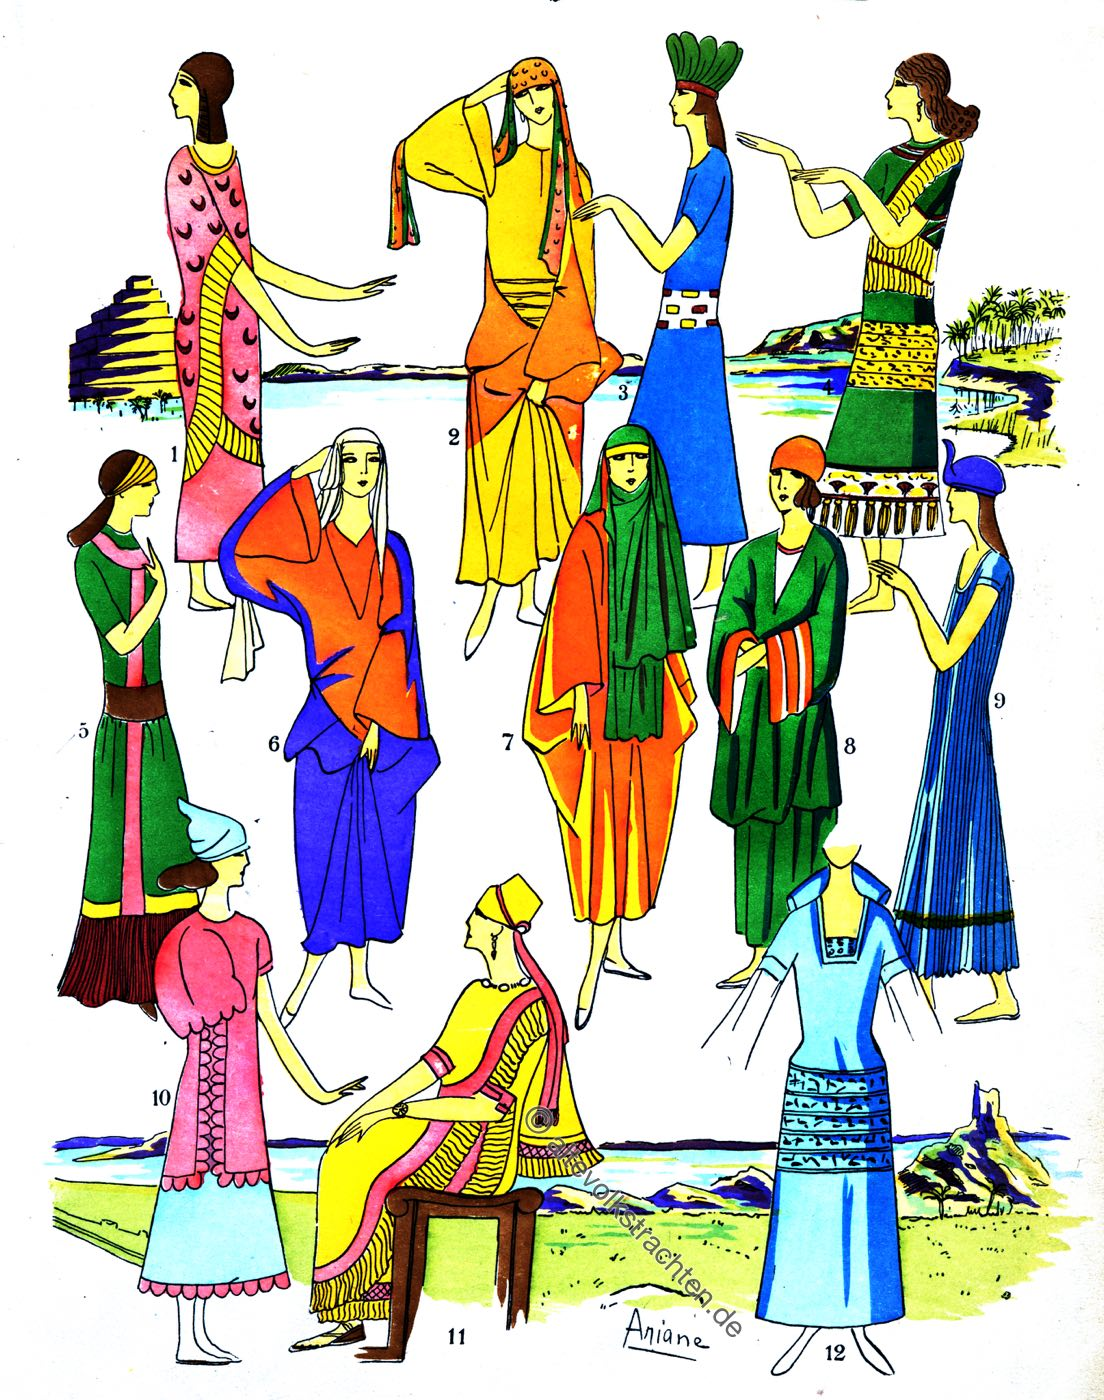 Elegante Frauen, Assyrien, Mesopotamien, Kleider, Mode, Kleidung, Trachten, Kostümgeschichte, Paul Louis de Giafferri